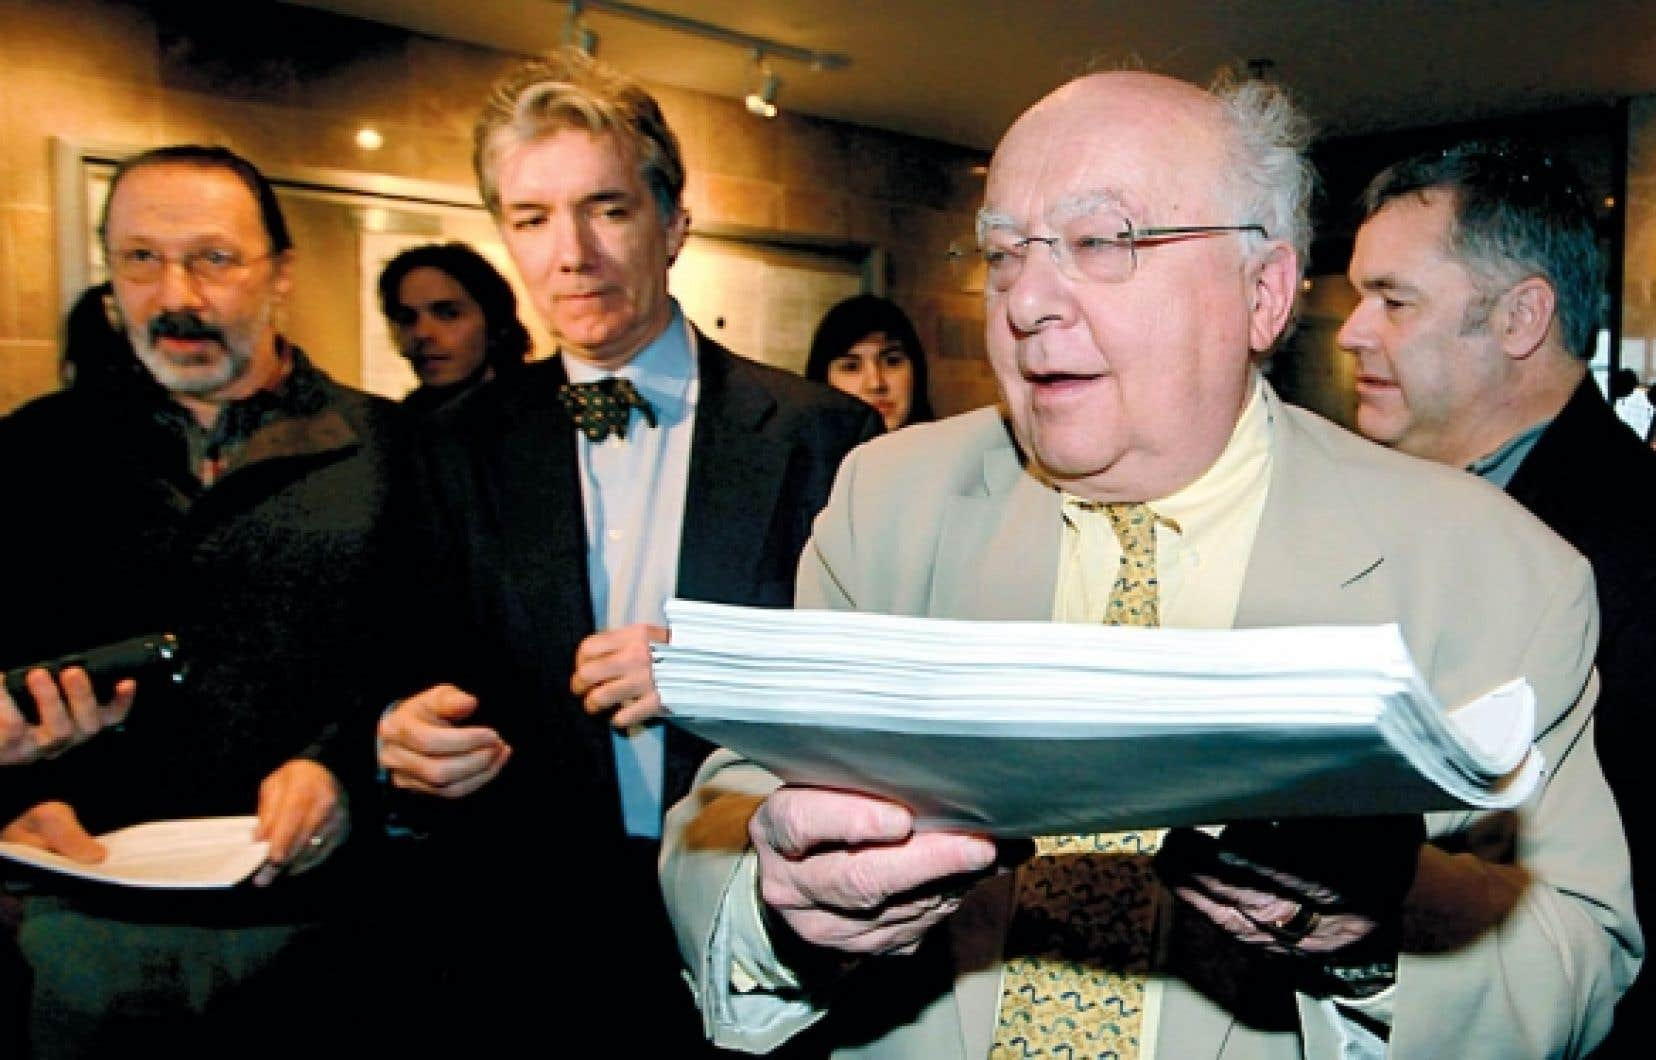 C&rsquo;est l&rsquo;avocat Julius Grey qui repr&eacute;sentera Daniel Turp dans cette cause.<br />